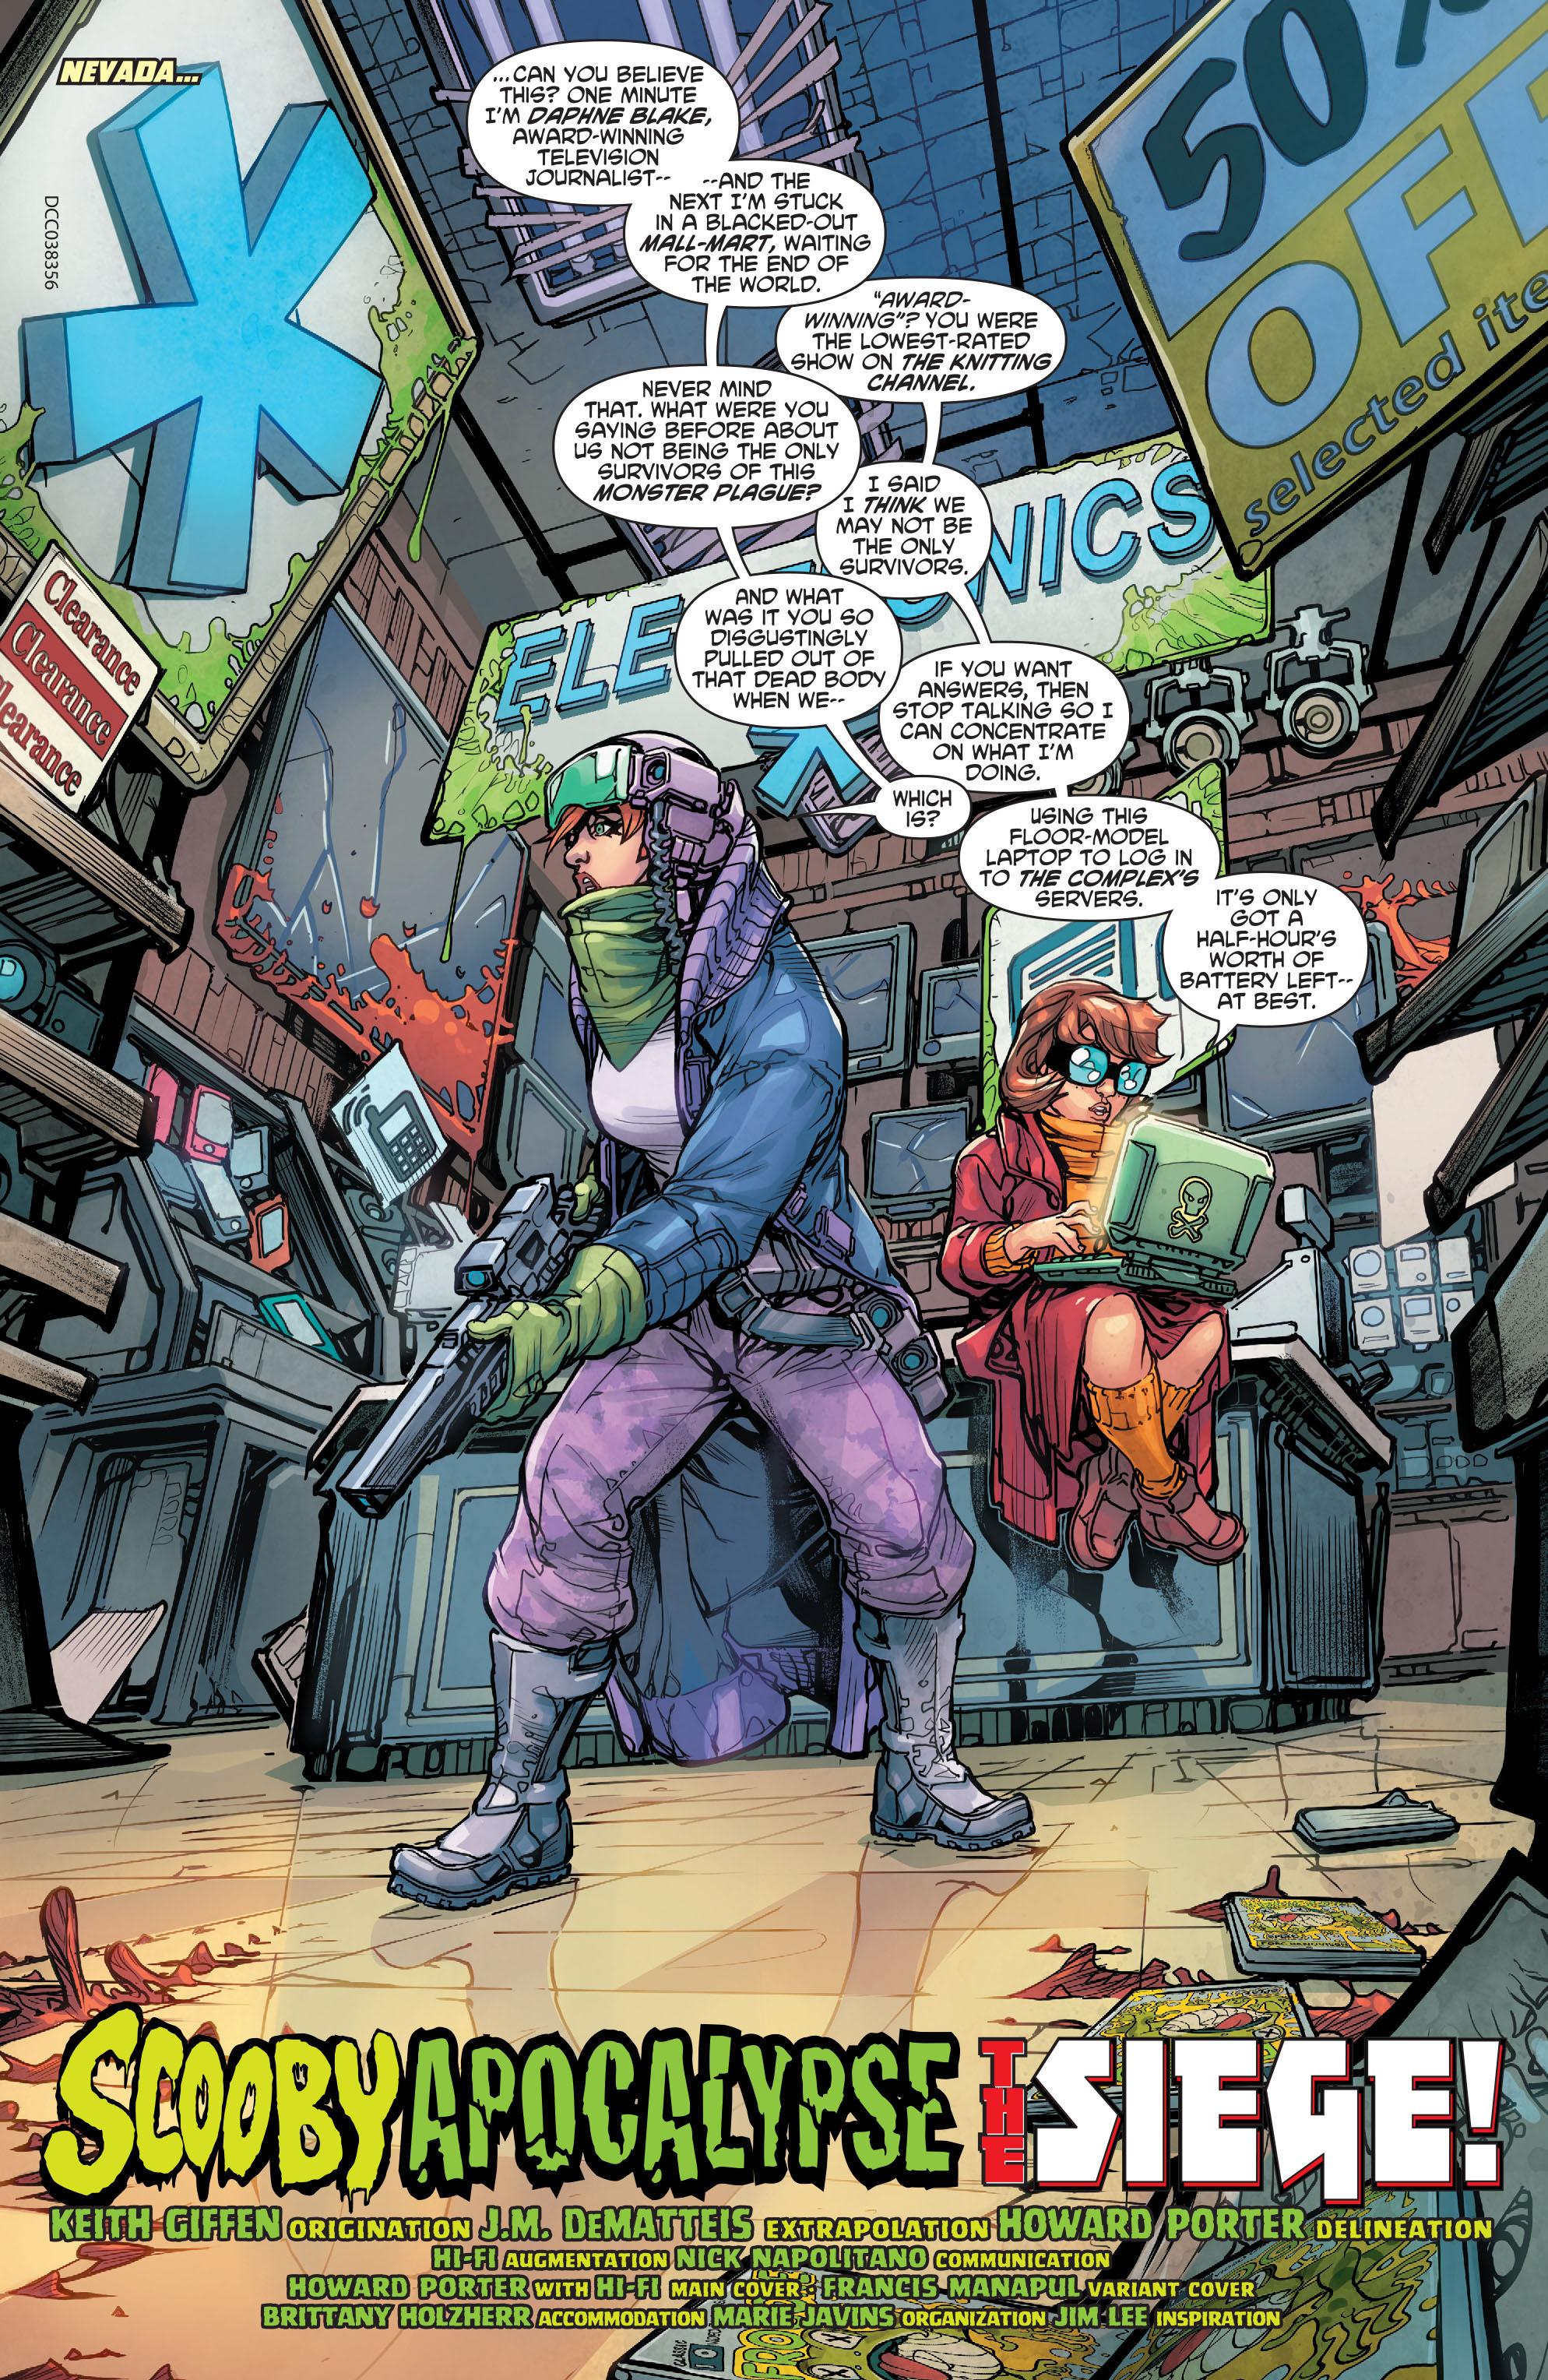 Read online Scooby Apocalypse comic -  Issue #5 - 4